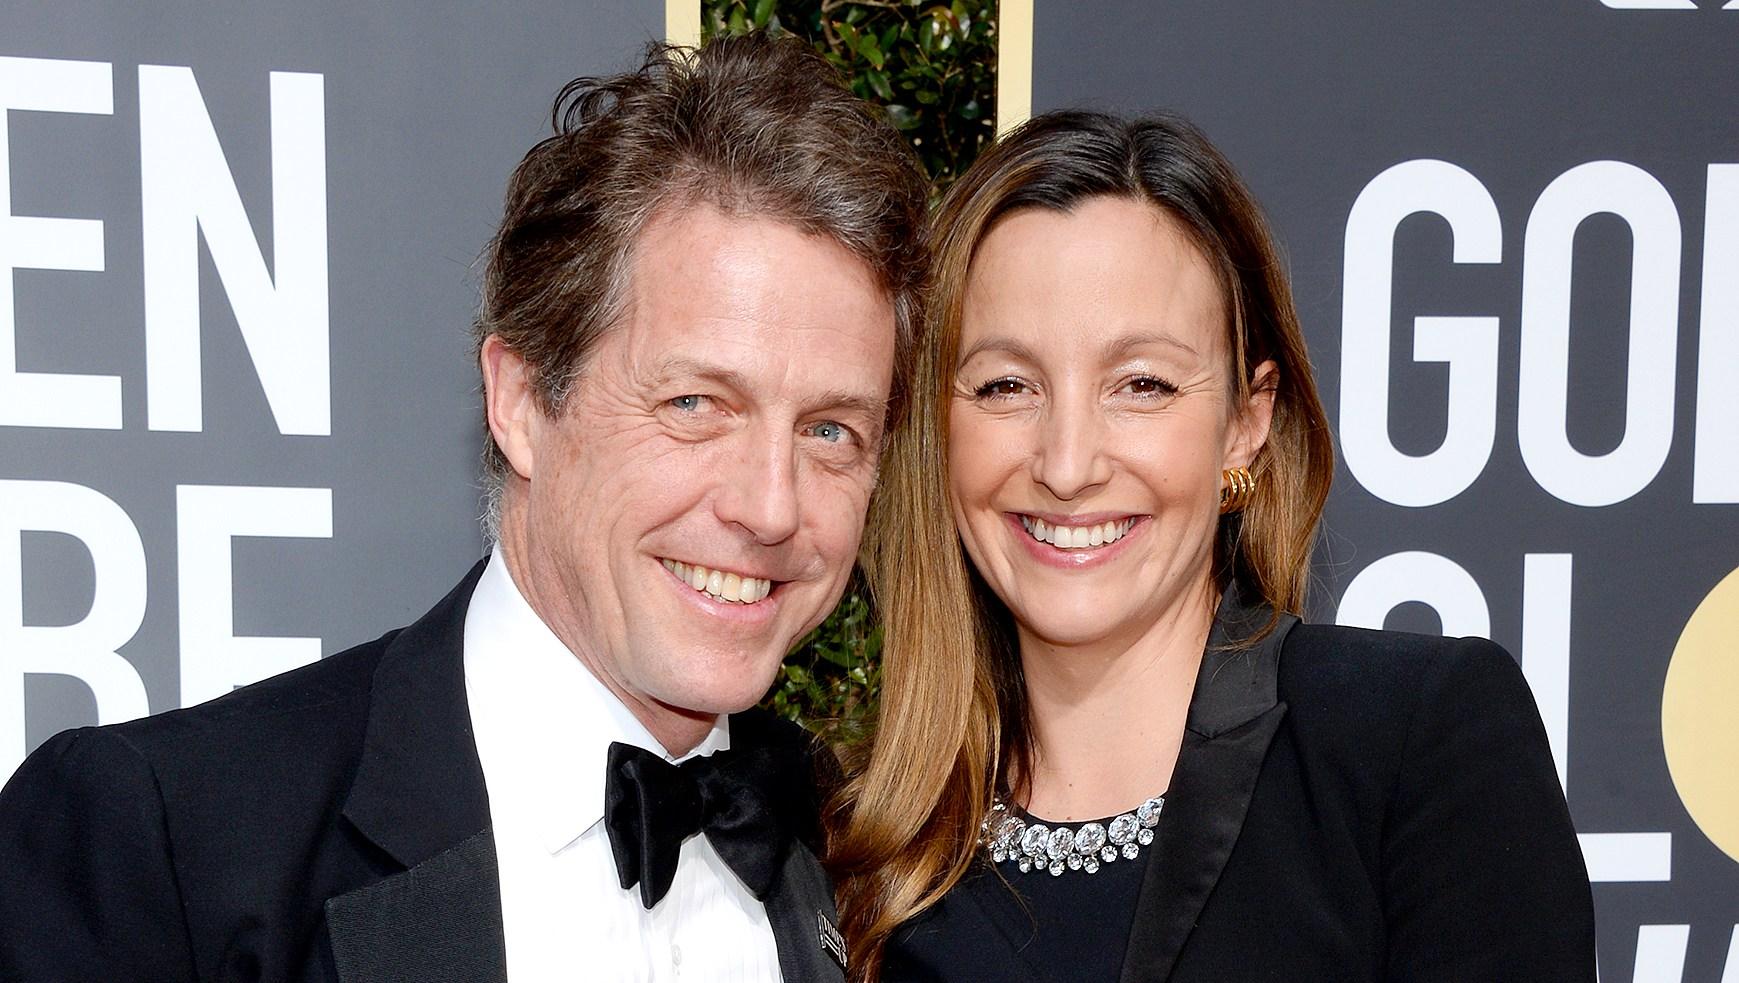 Hugh-Grant-and-Anna-Eberstein-engaged